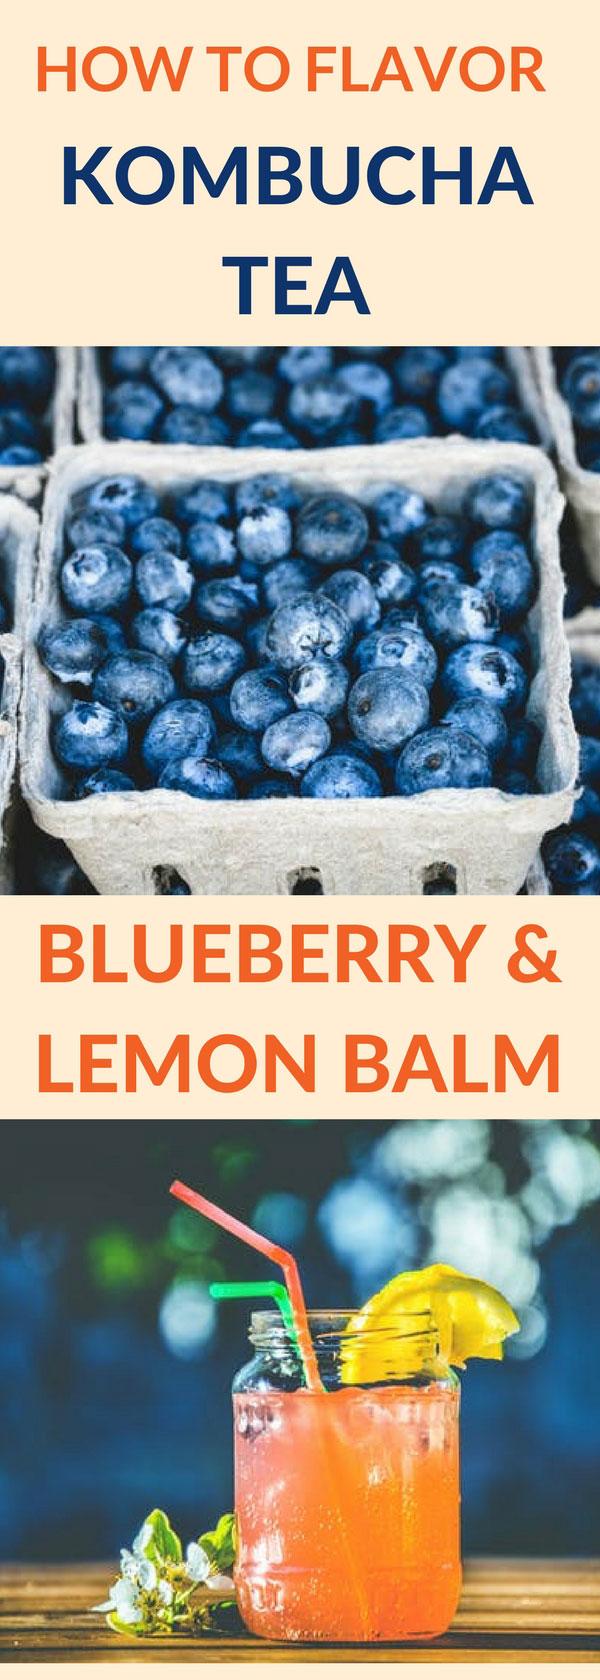 flavor kombucha blueberry lemon pin